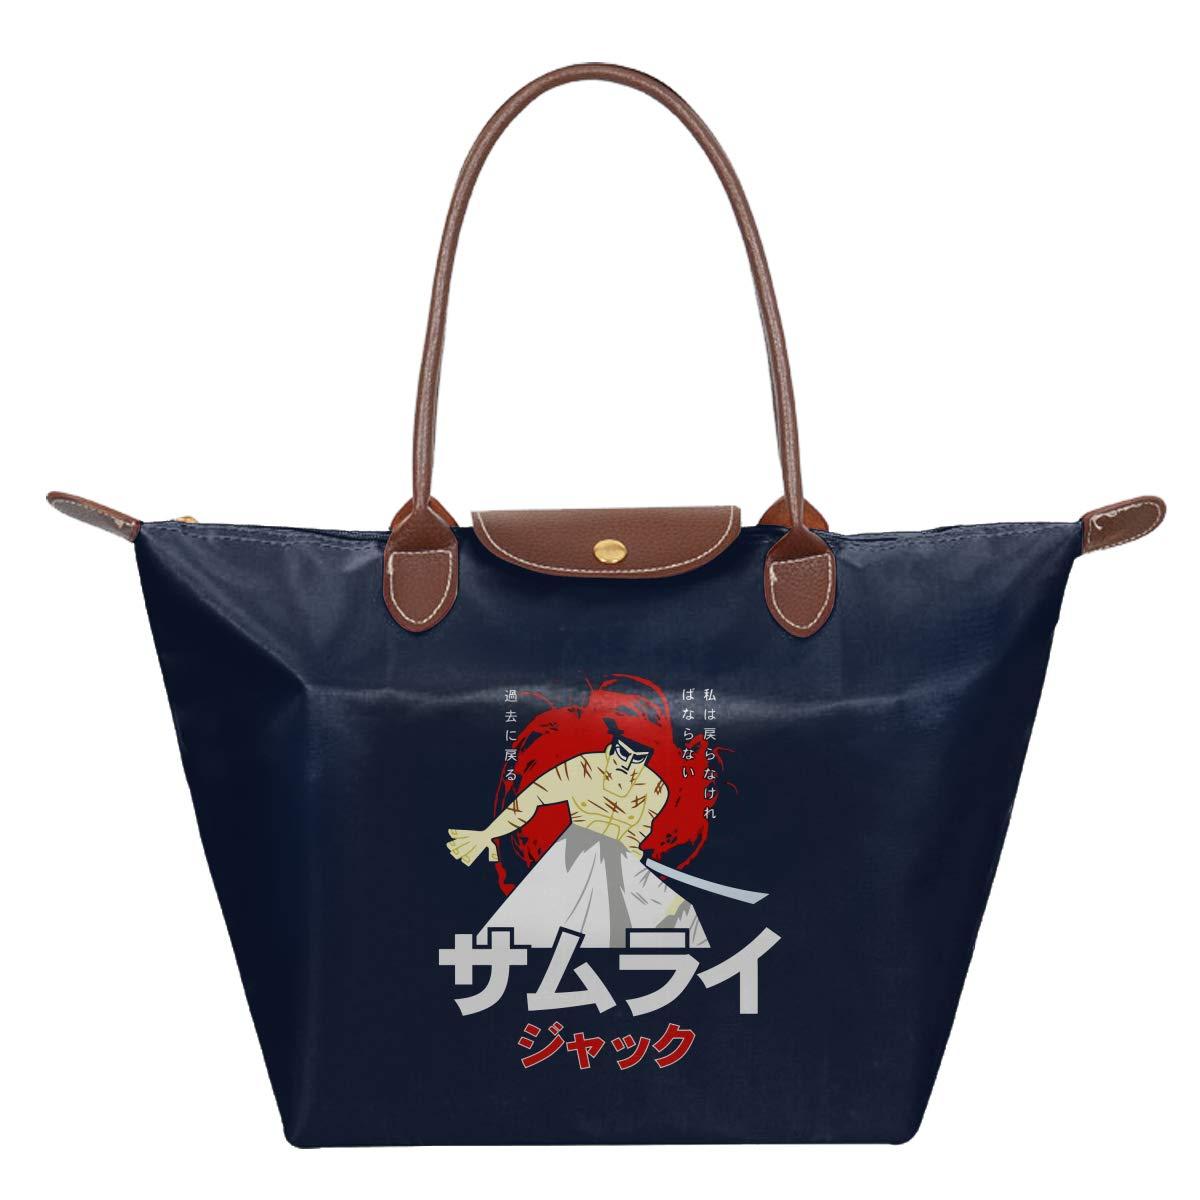 Samurai Jack Leather Handbag Purse